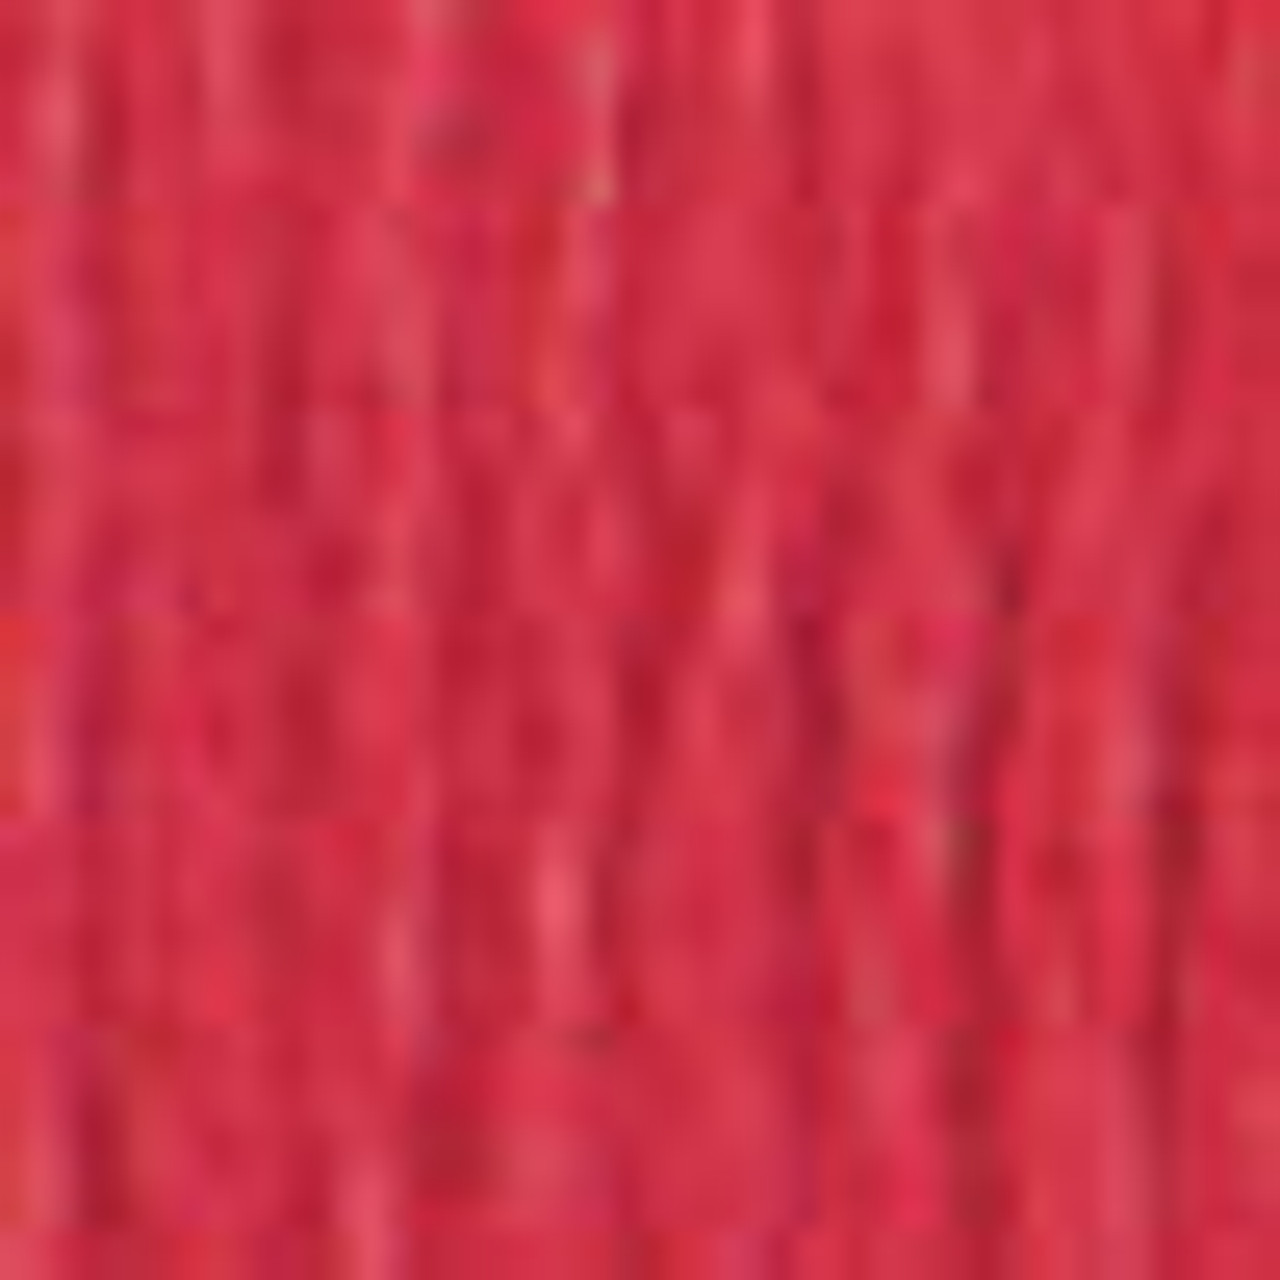 DMC # 3831 Dark Rasberry Floss / Thread